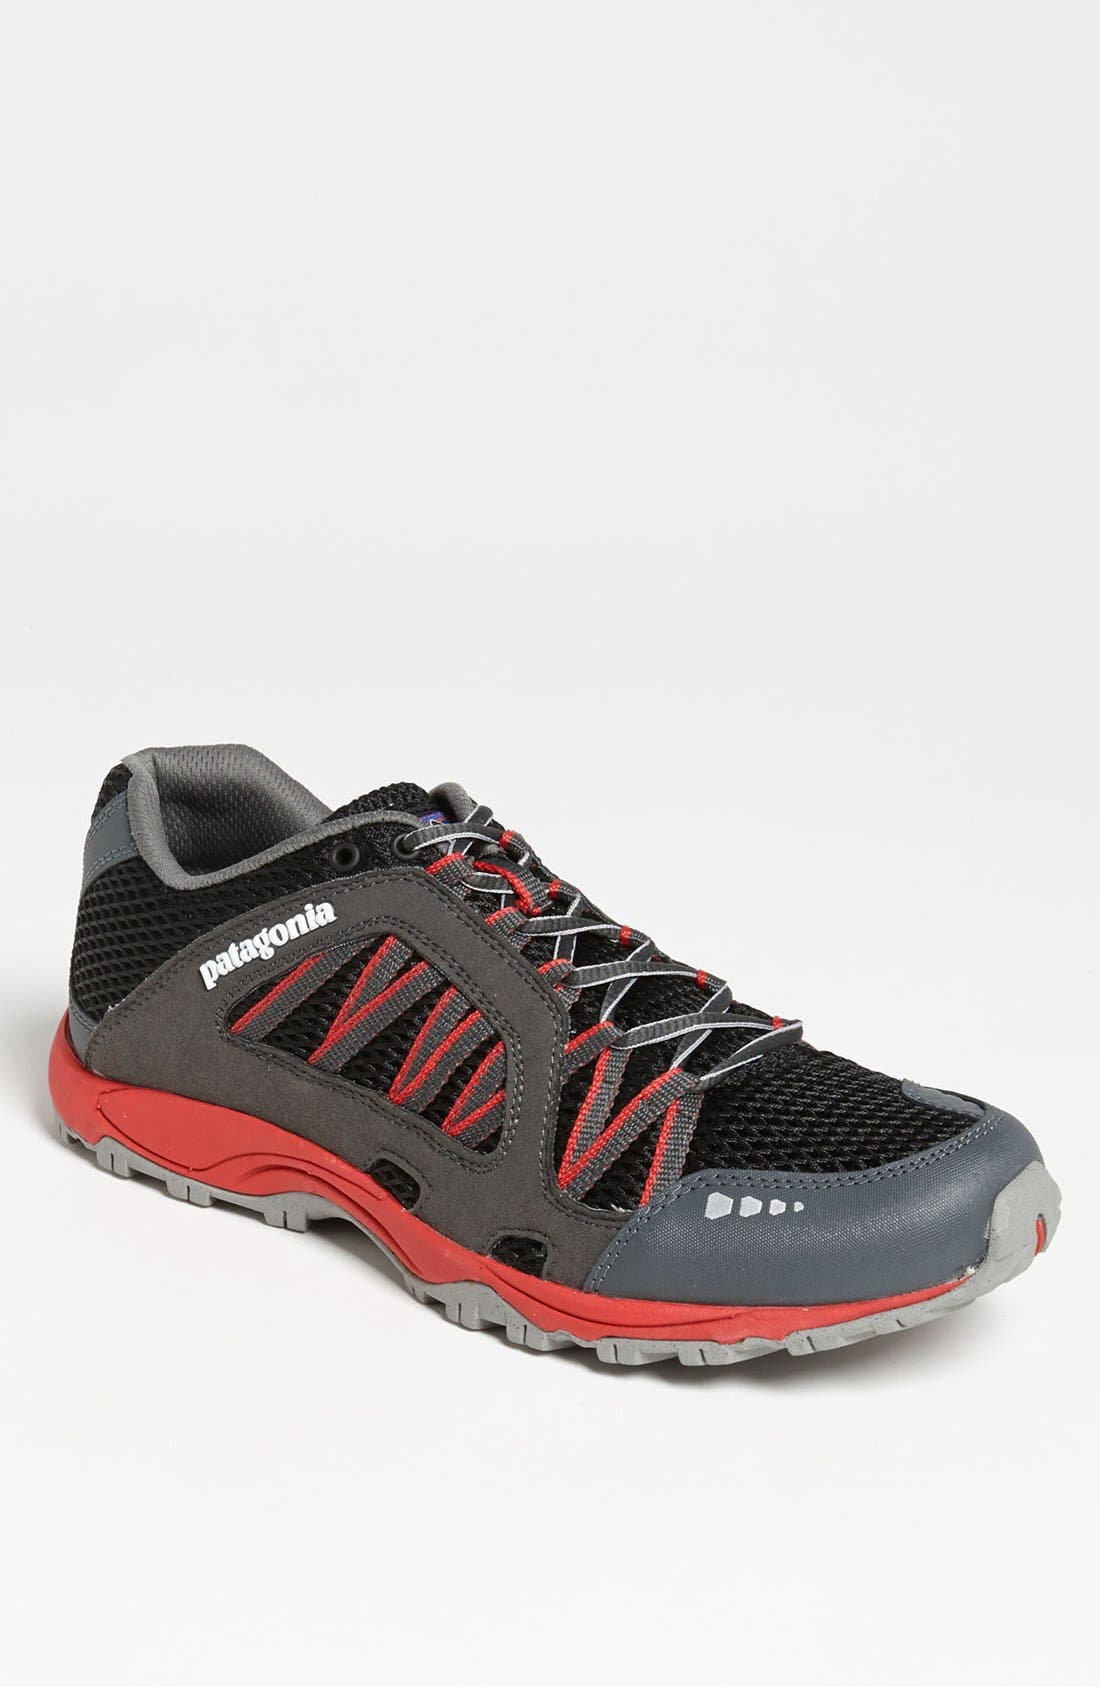 Main Image - Patagonia 'Fore Runner' Trail Running Shoe (Men)